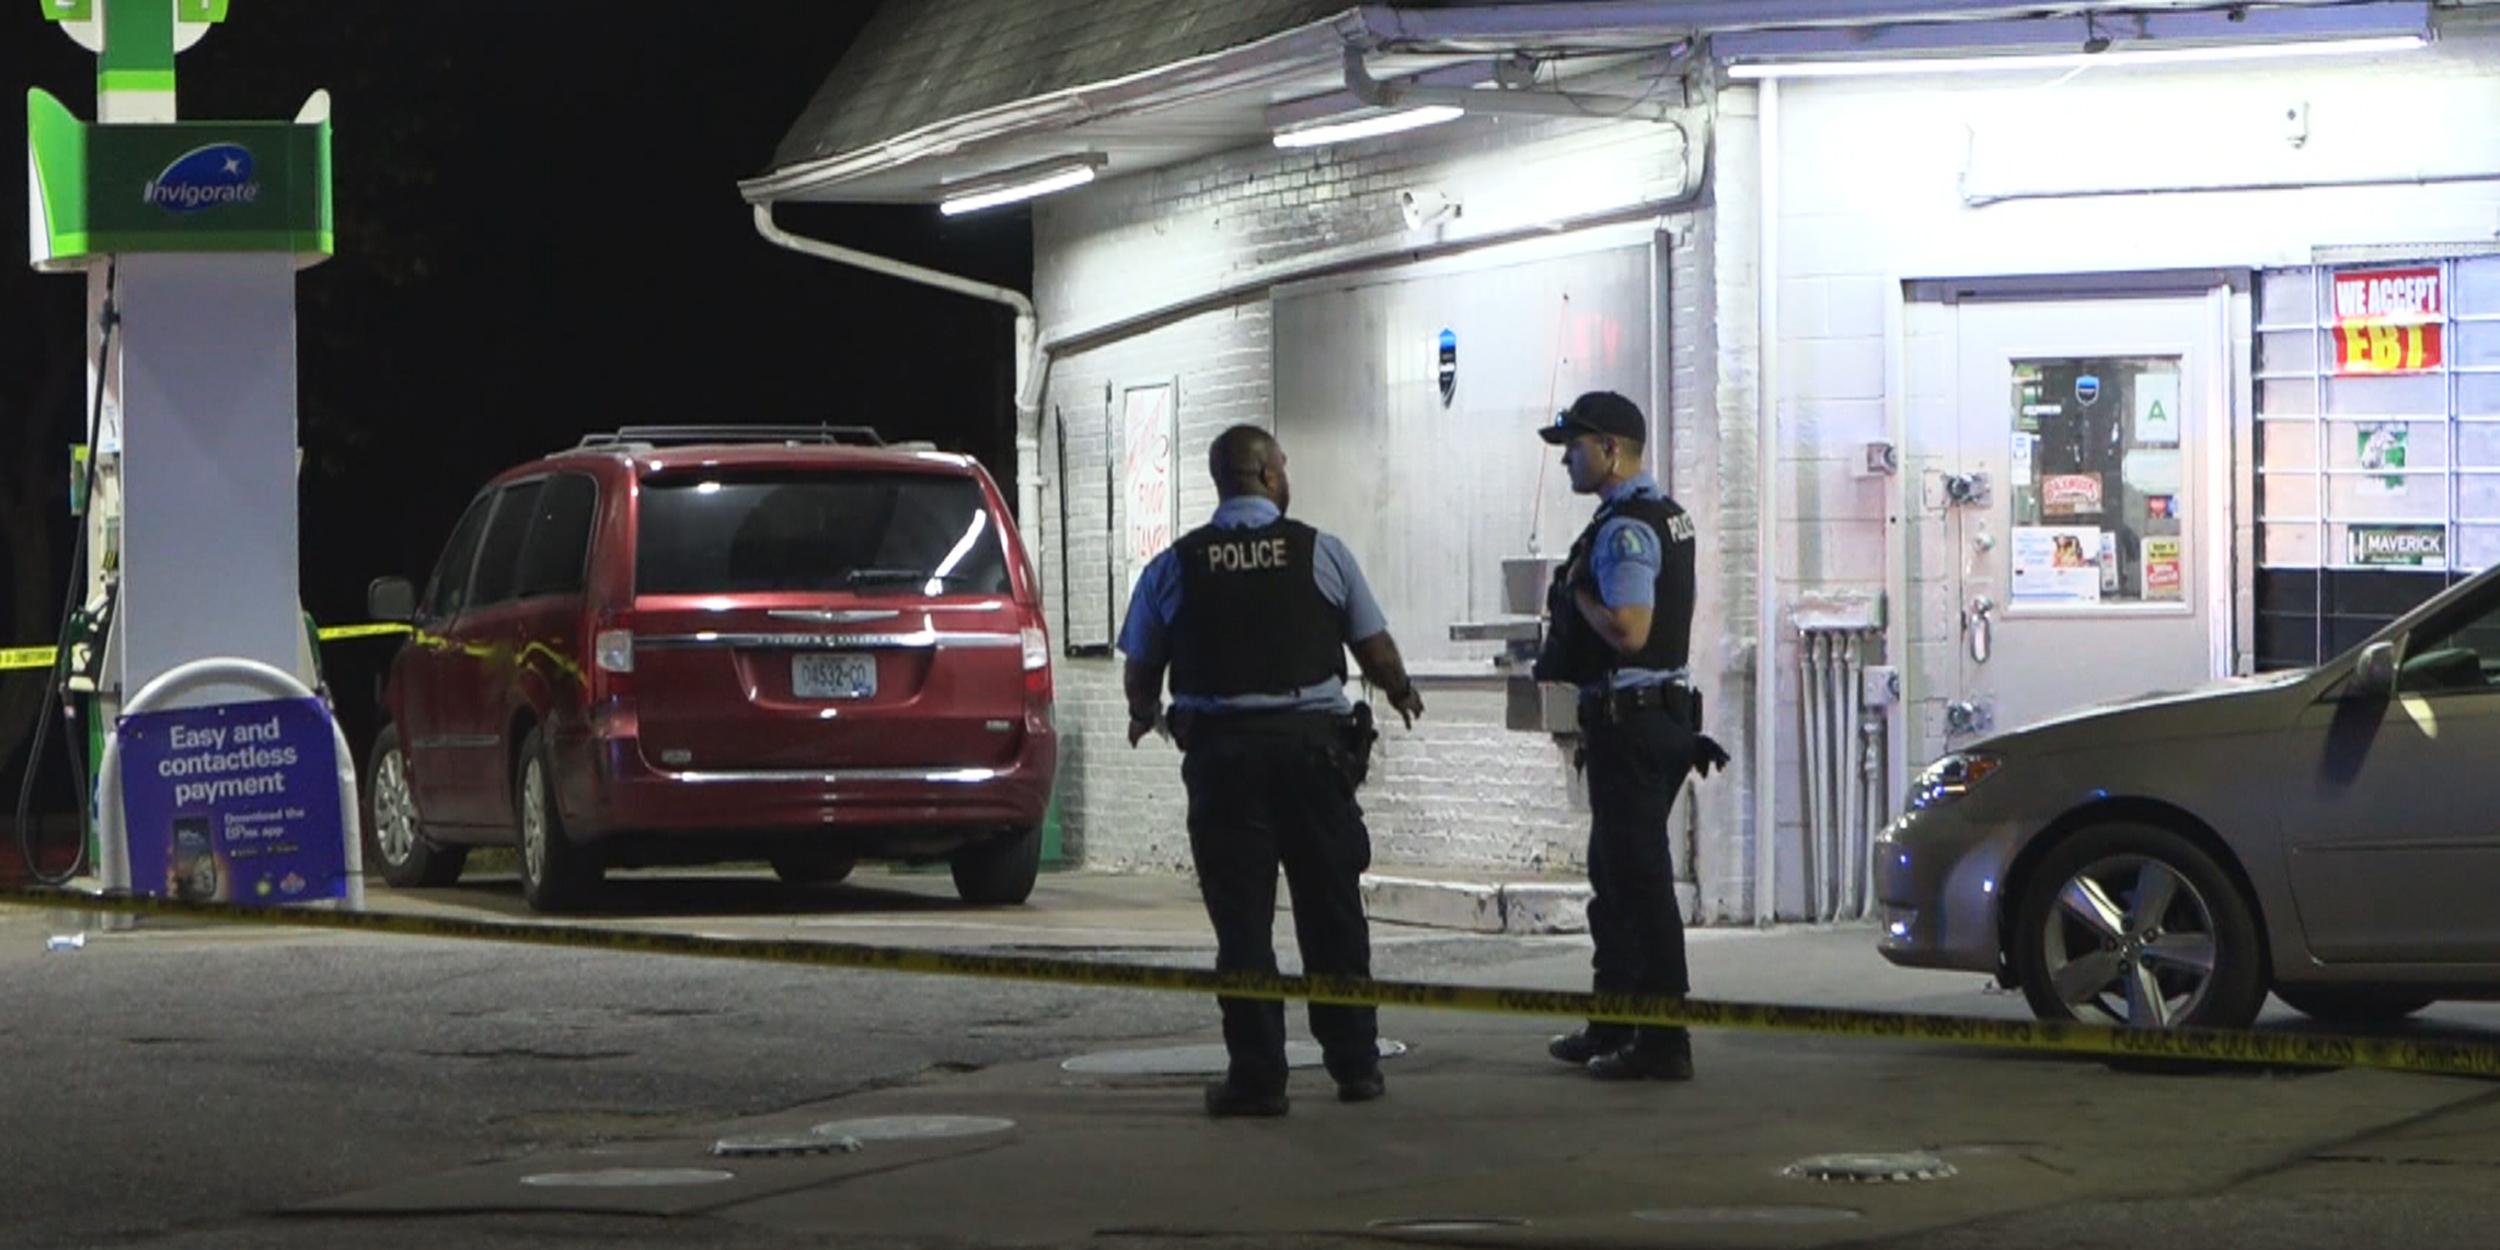 Murders targeting sex workers in St. Louis under investigation